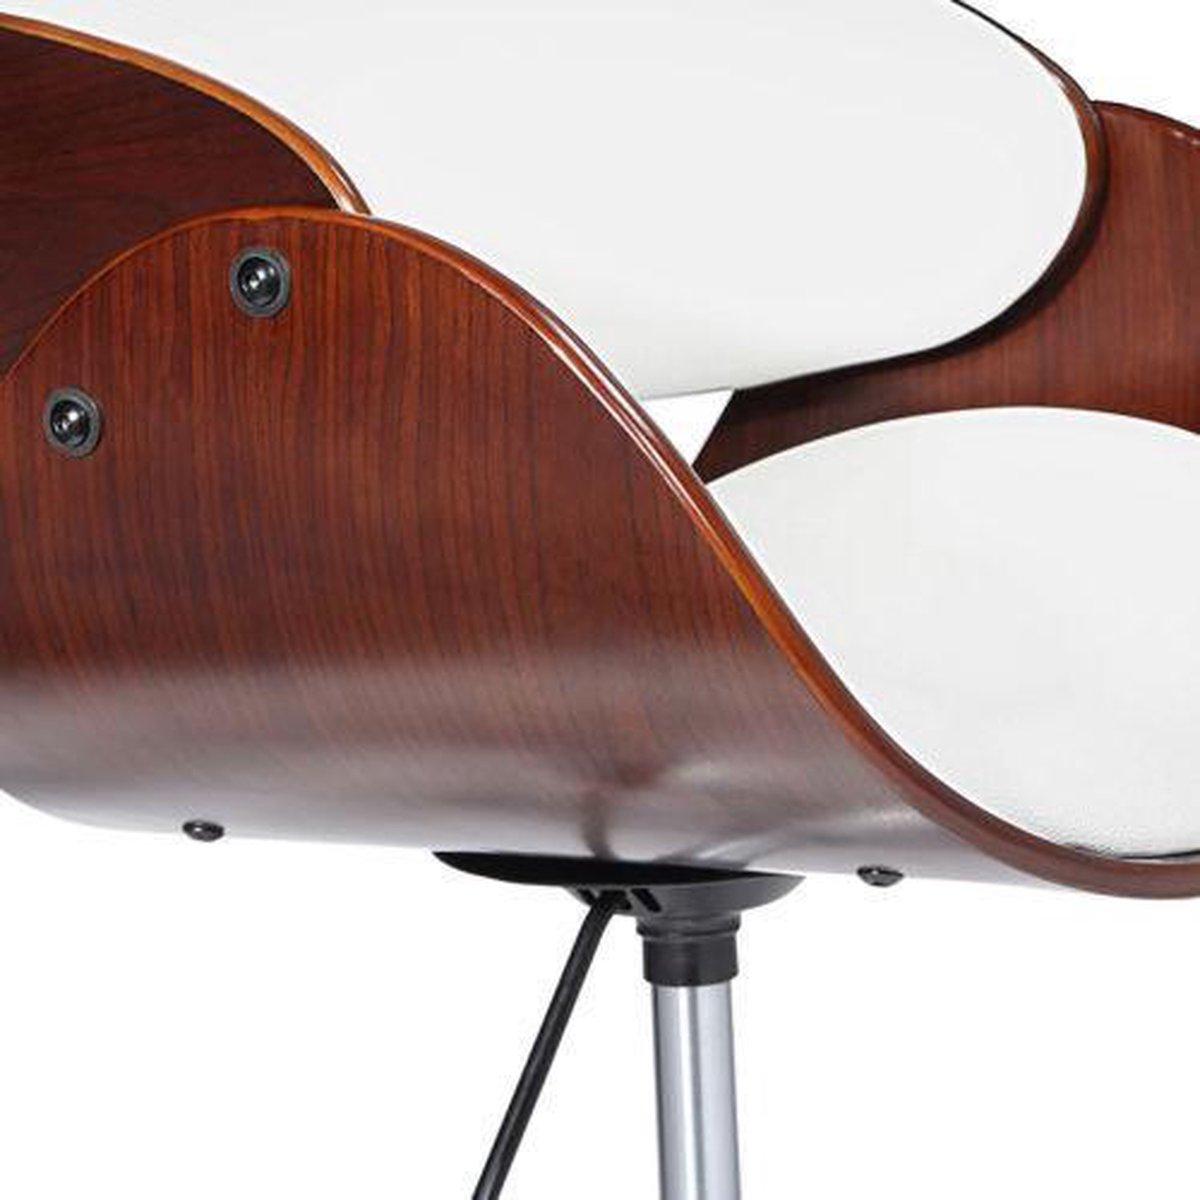 Vintage Bureaustoel De Wit.Bol Com Design Bureaustoel Retro Wit Bruin